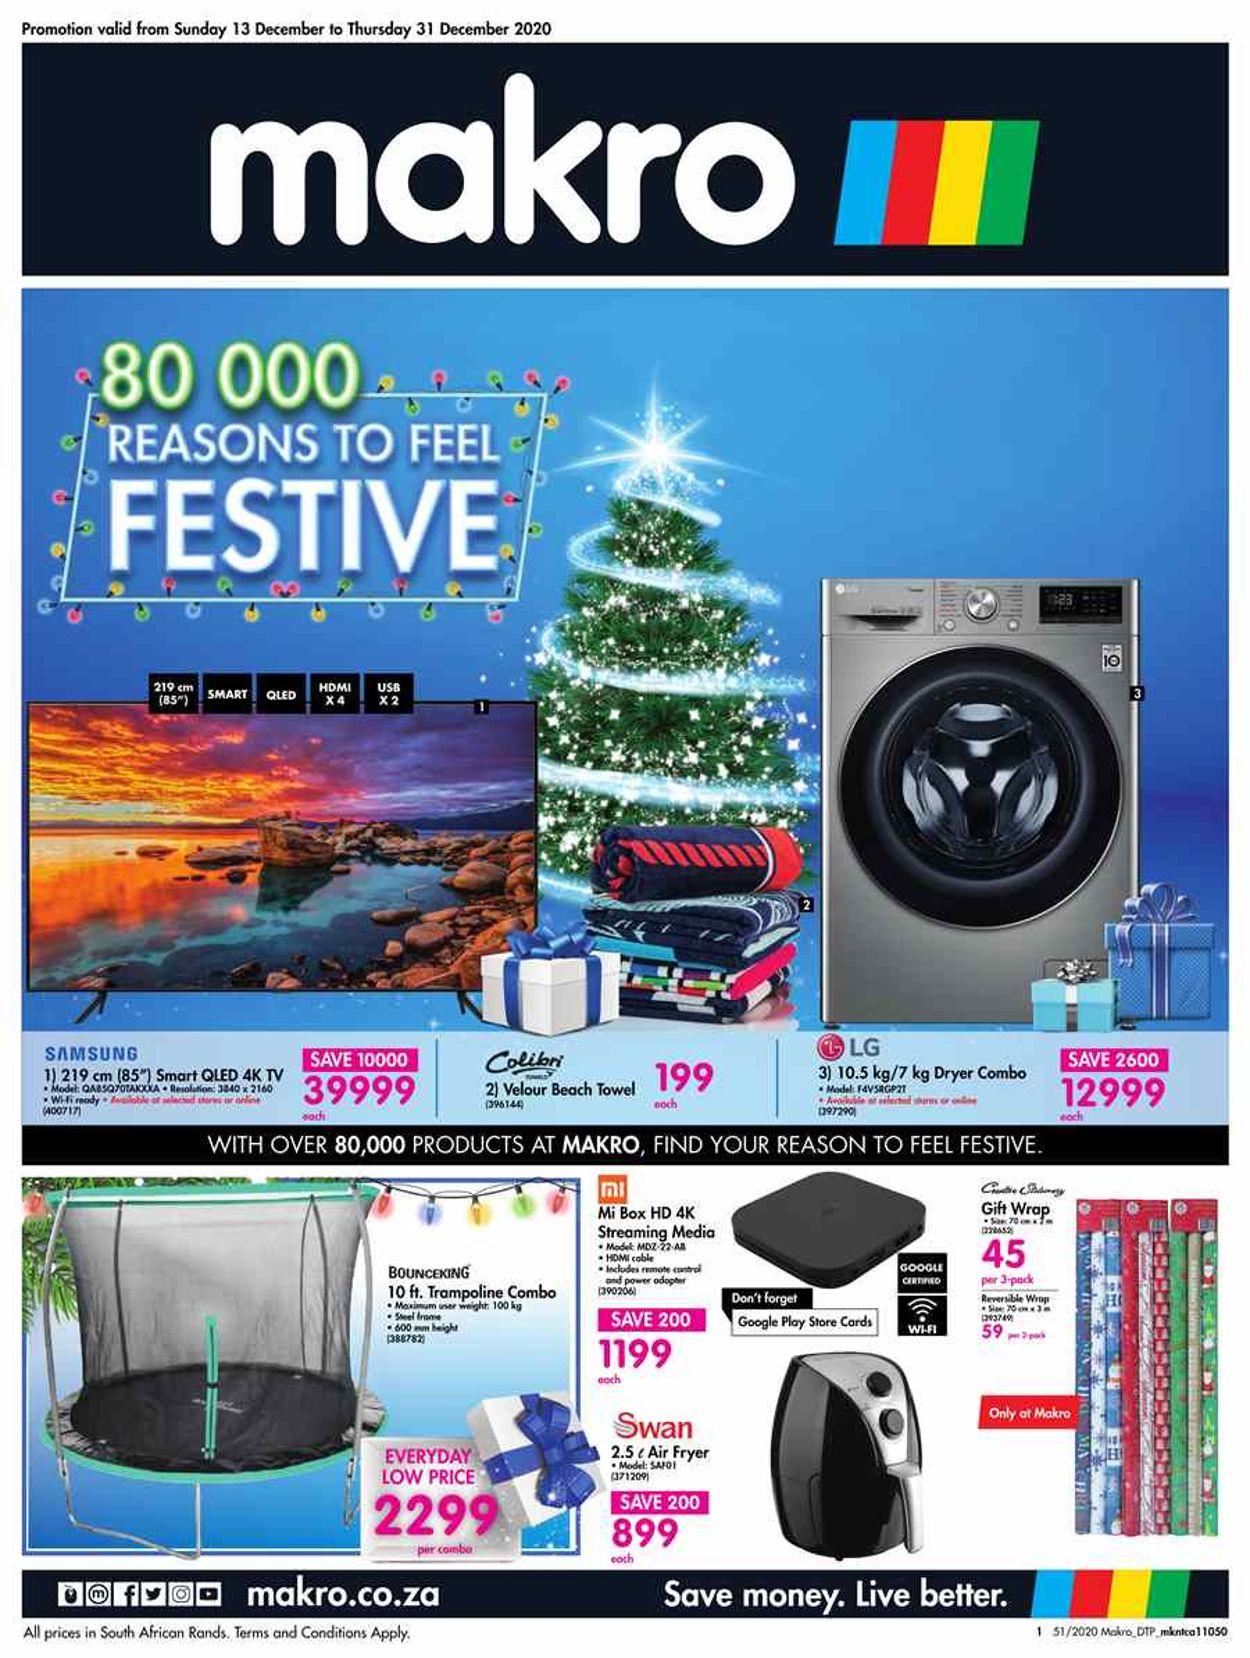 Makro Christmas Savings 2020 Catalogue - 2020/12/13-2020/12/31